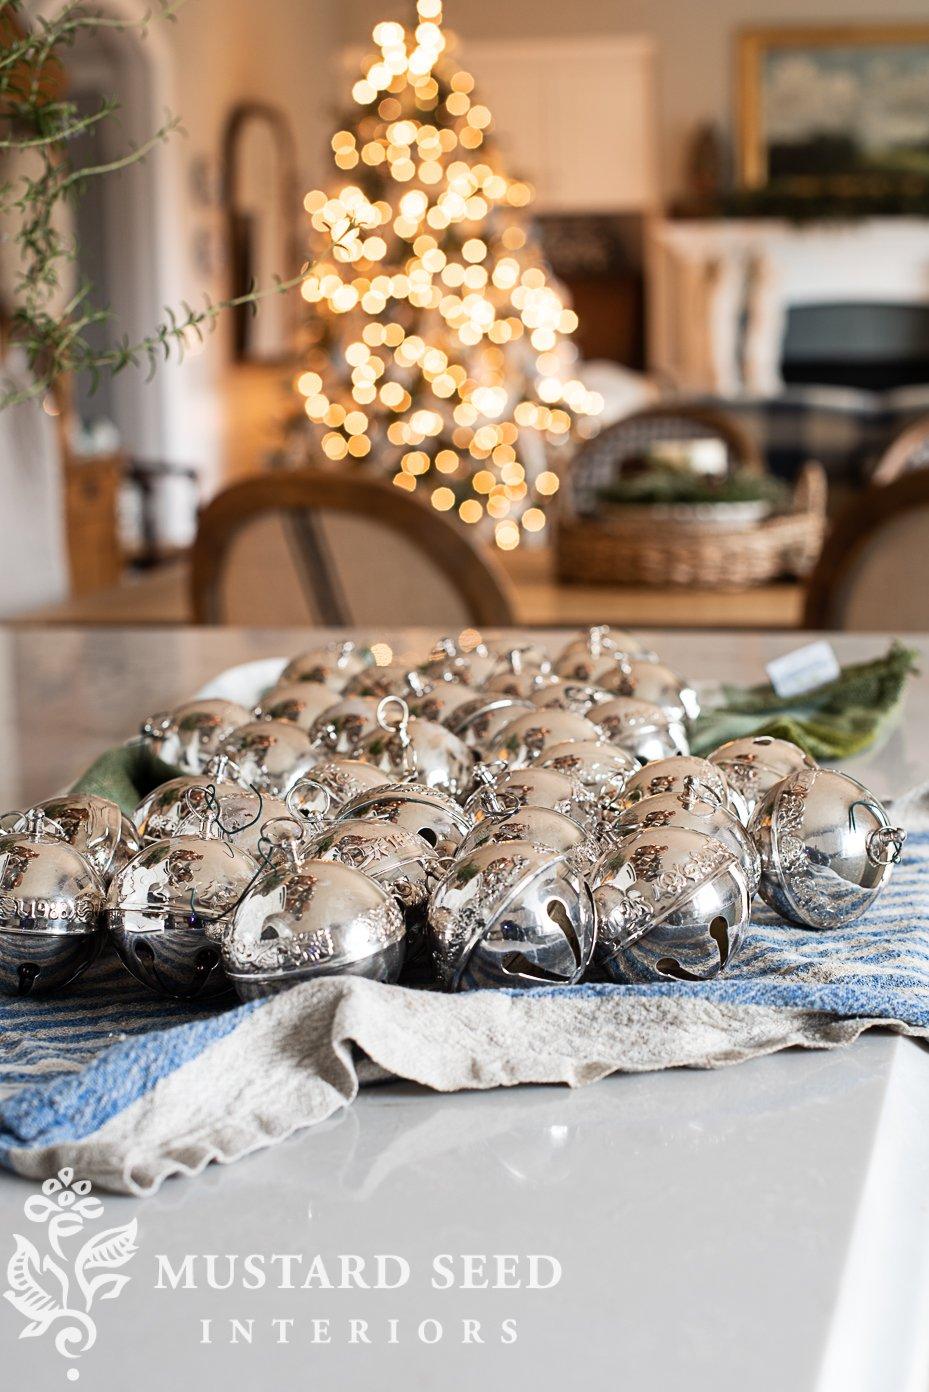 wallace sleigh bells | miss mustard seed